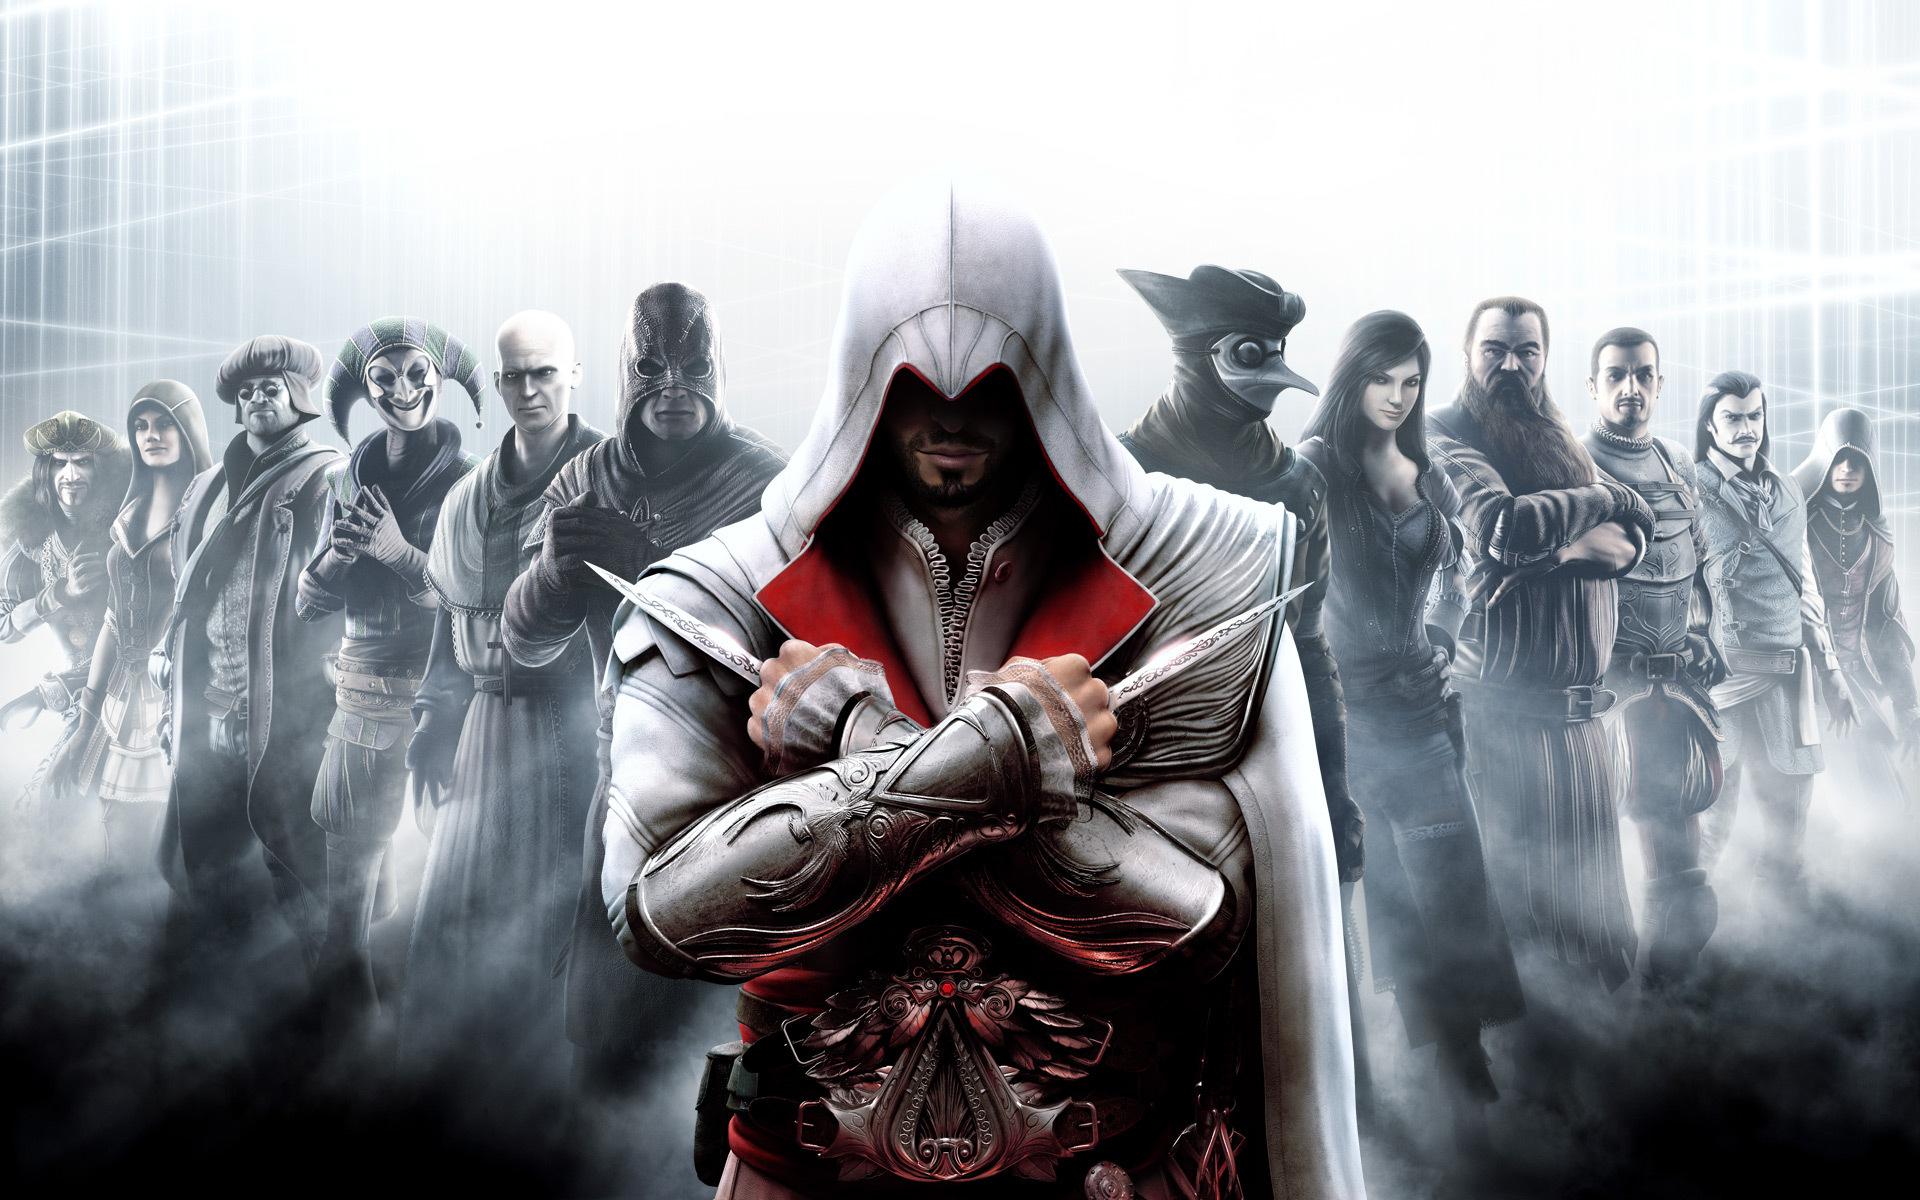 Assassins Creed Brotherhood Wallpaper ezio assassin 1920x1200